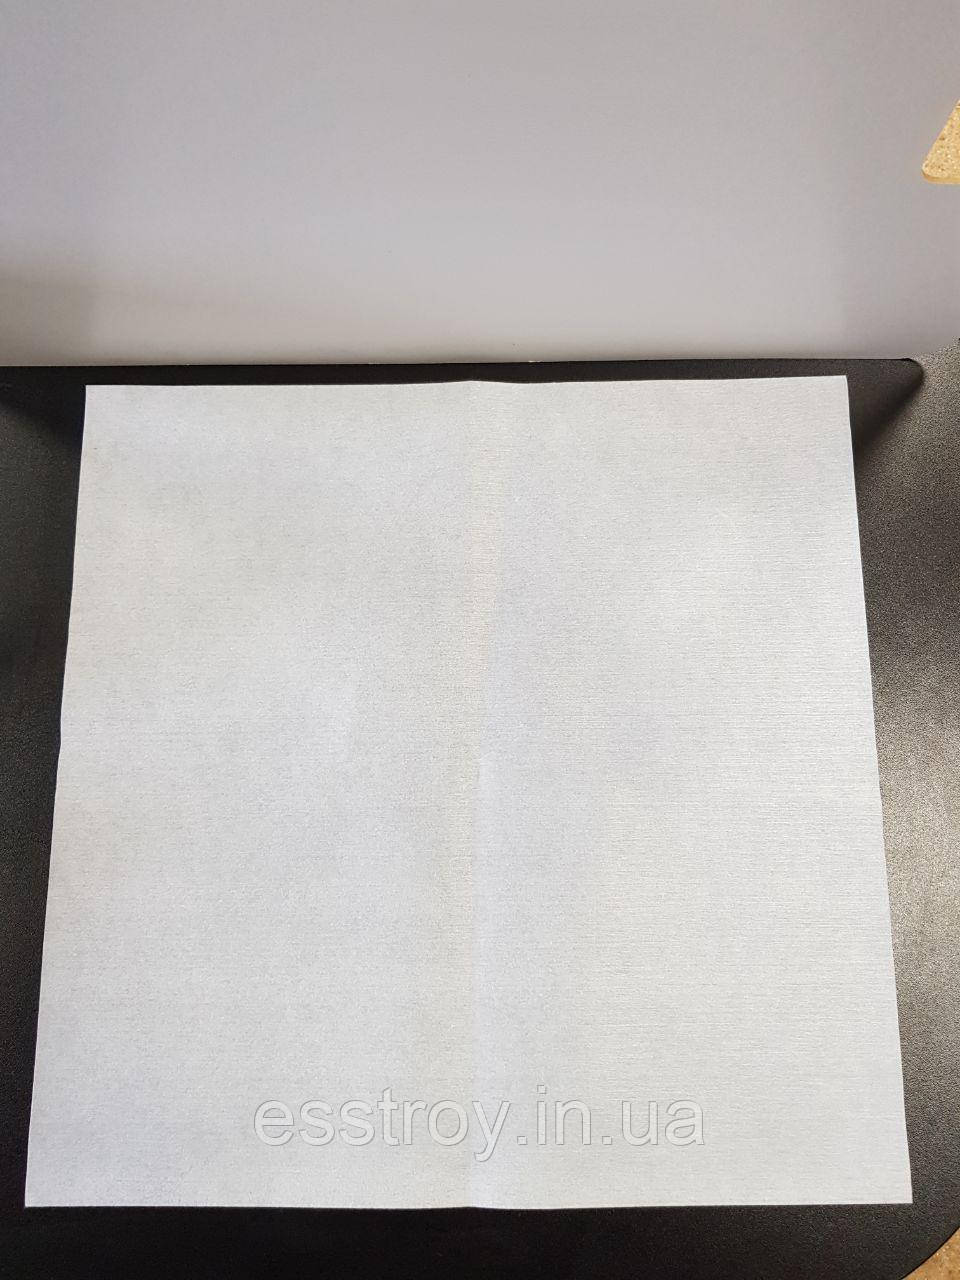 Квадрат для уплотнения и изоляции 450х450